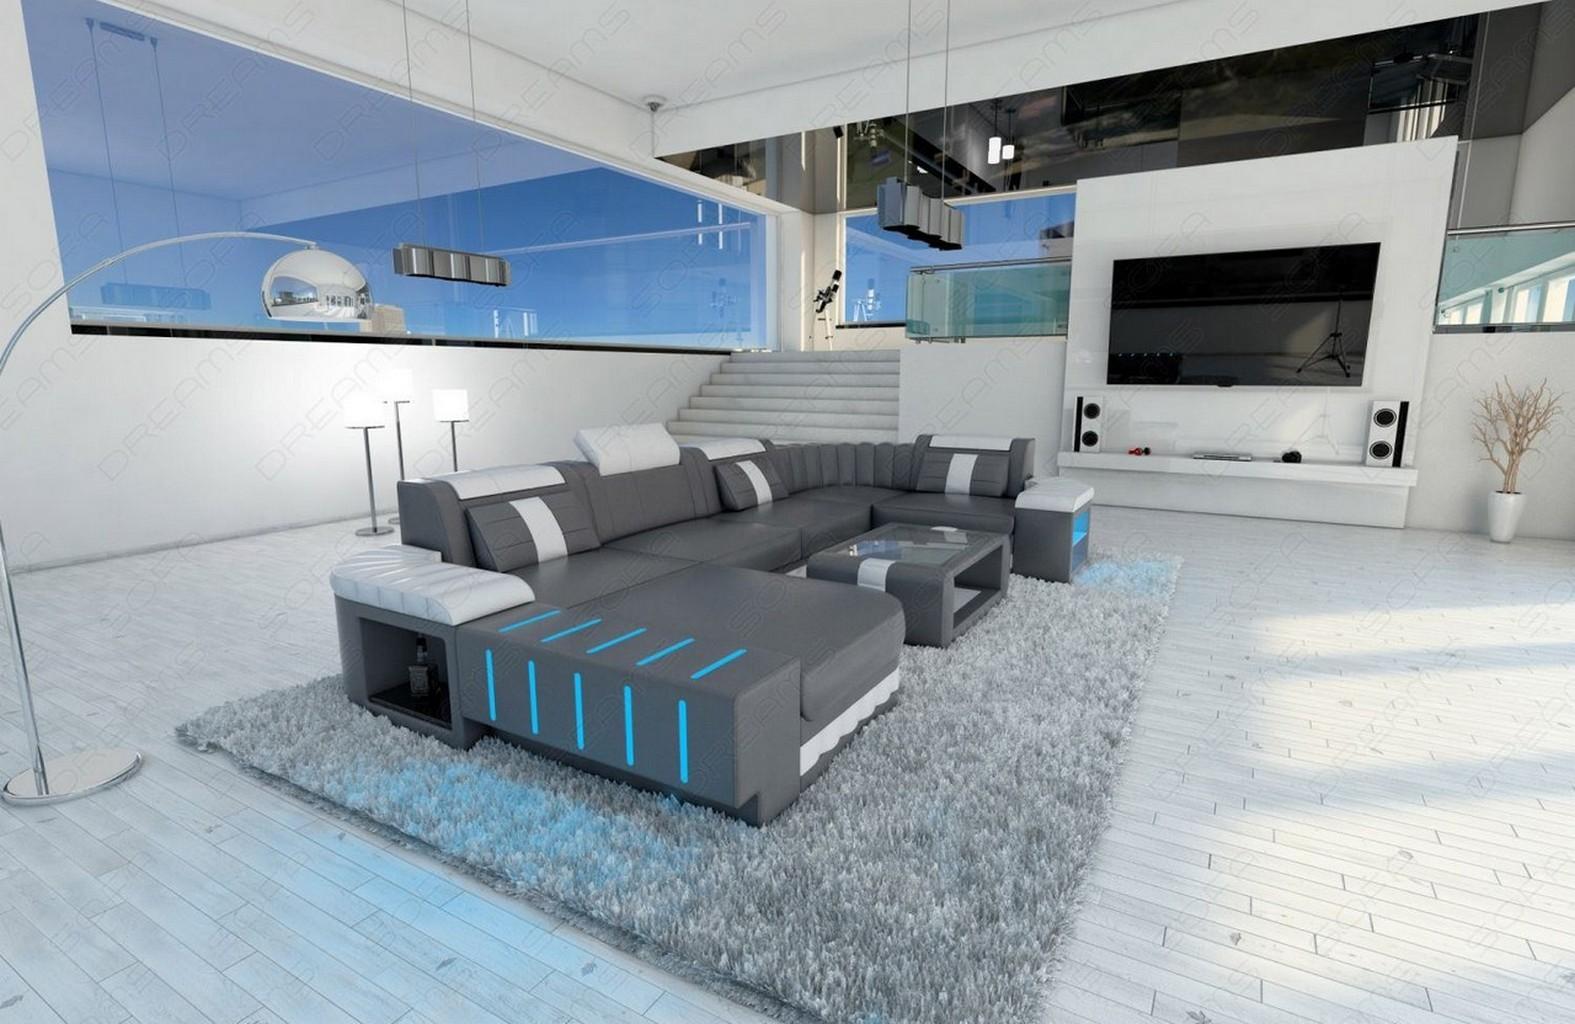 polstersofa bellagio u form grau weiss led beleuchtung. Black Bedroom Furniture Sets. Home Design Ideas